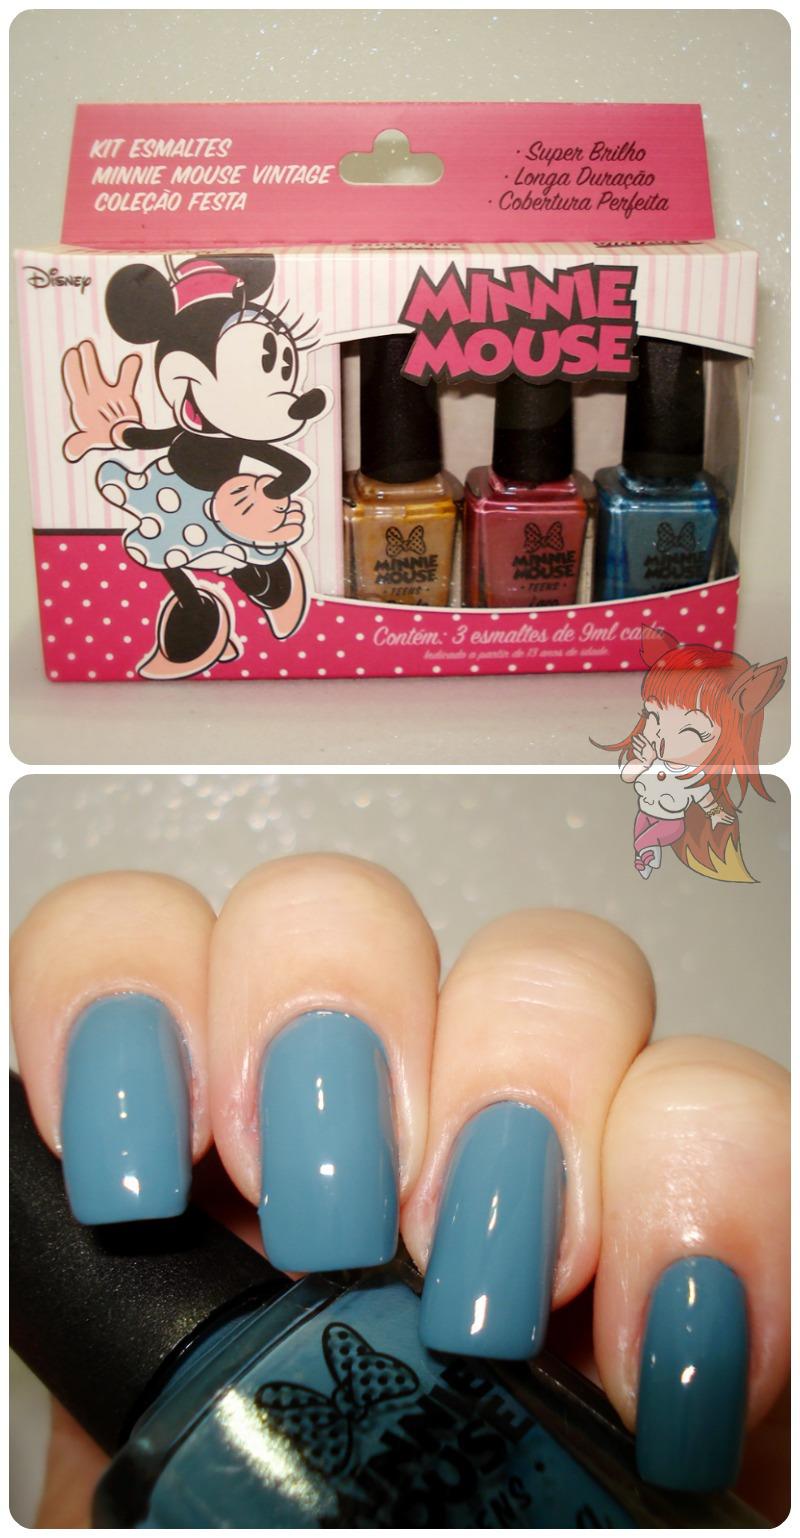 Esmalte Minnie Mouse - Pluma - Resenha